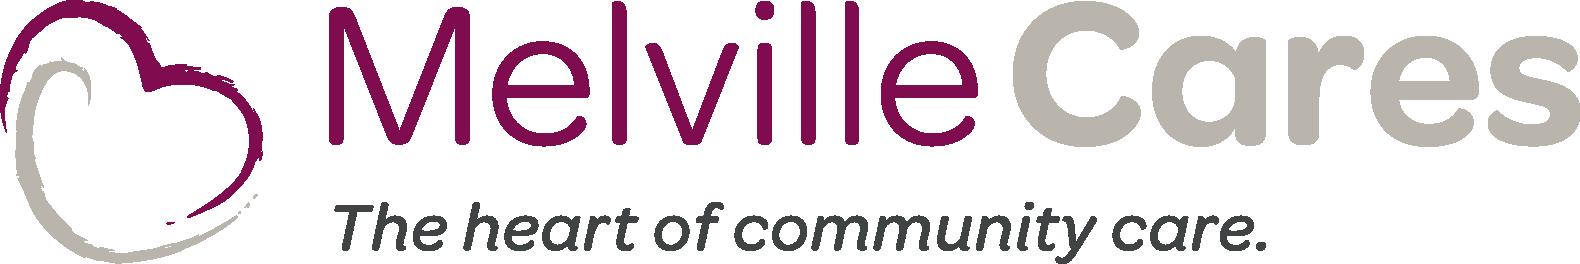 Melville Cares Inc